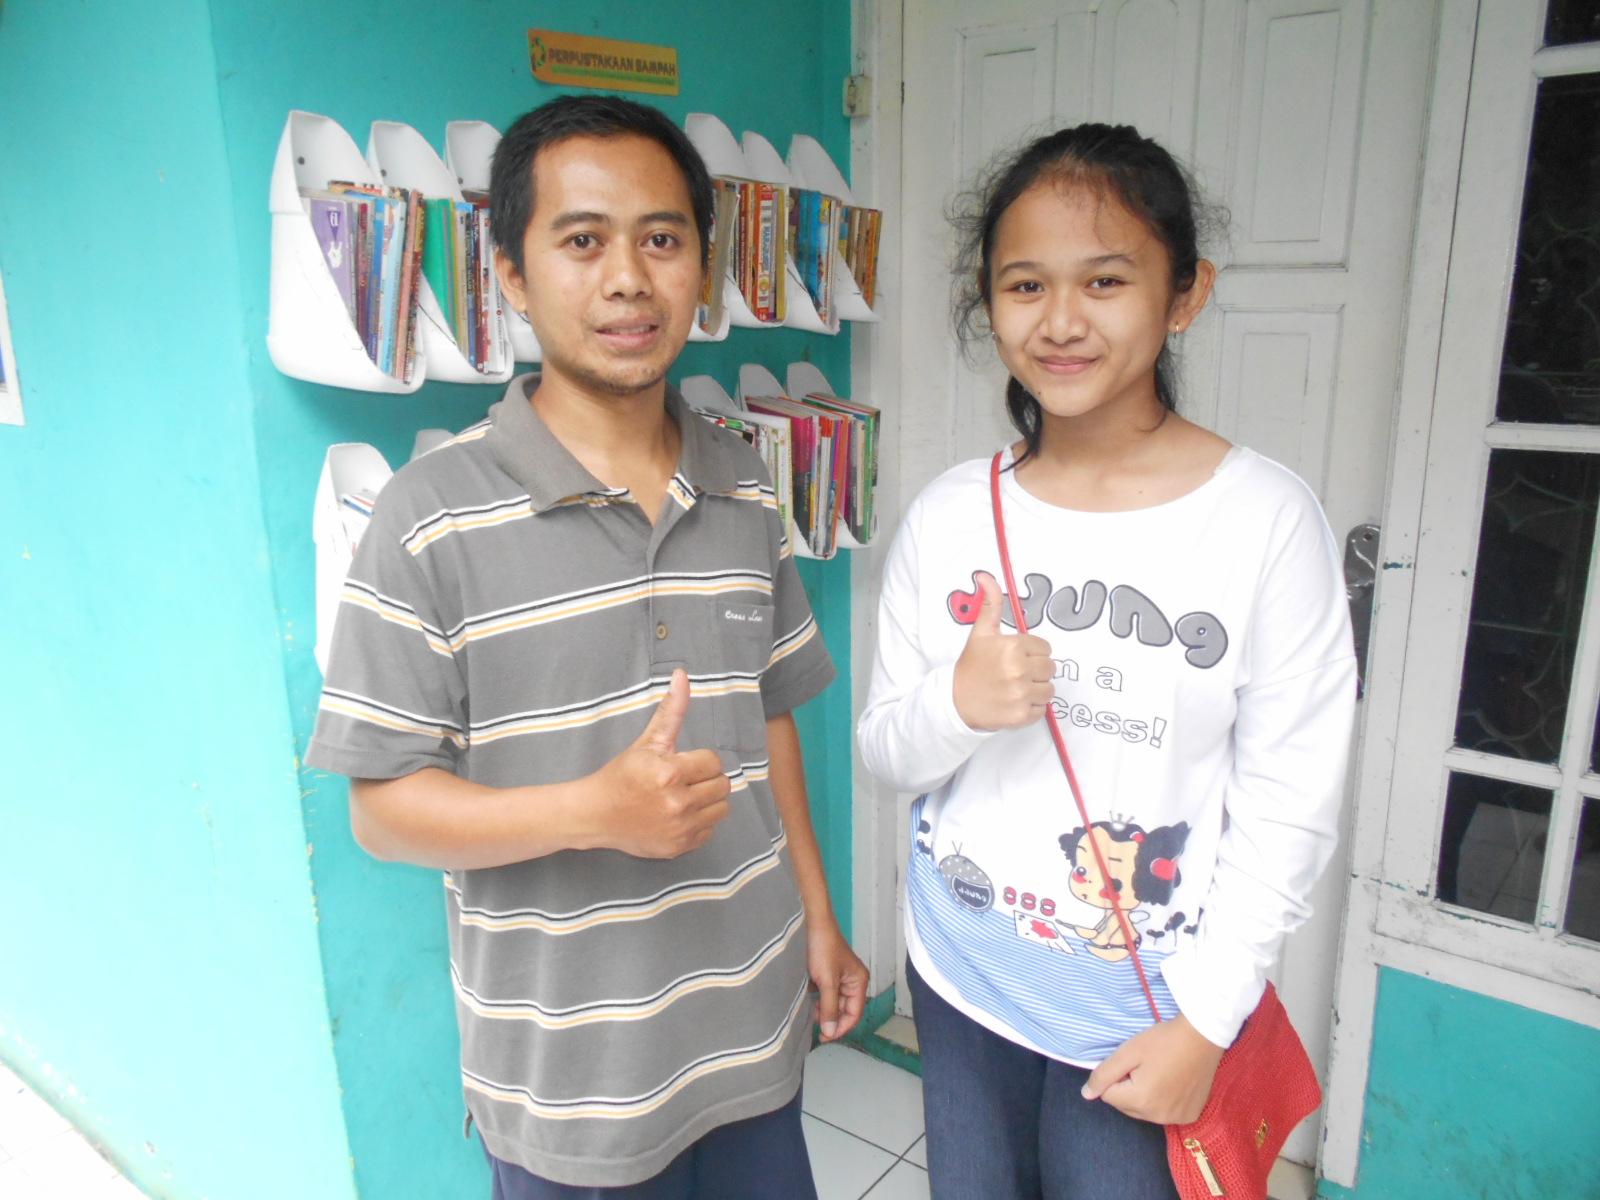 Kunjungan Duta Sanitasi Jawa Barat 2016, Bernica Alfitri Rachman 21 Juli 2016